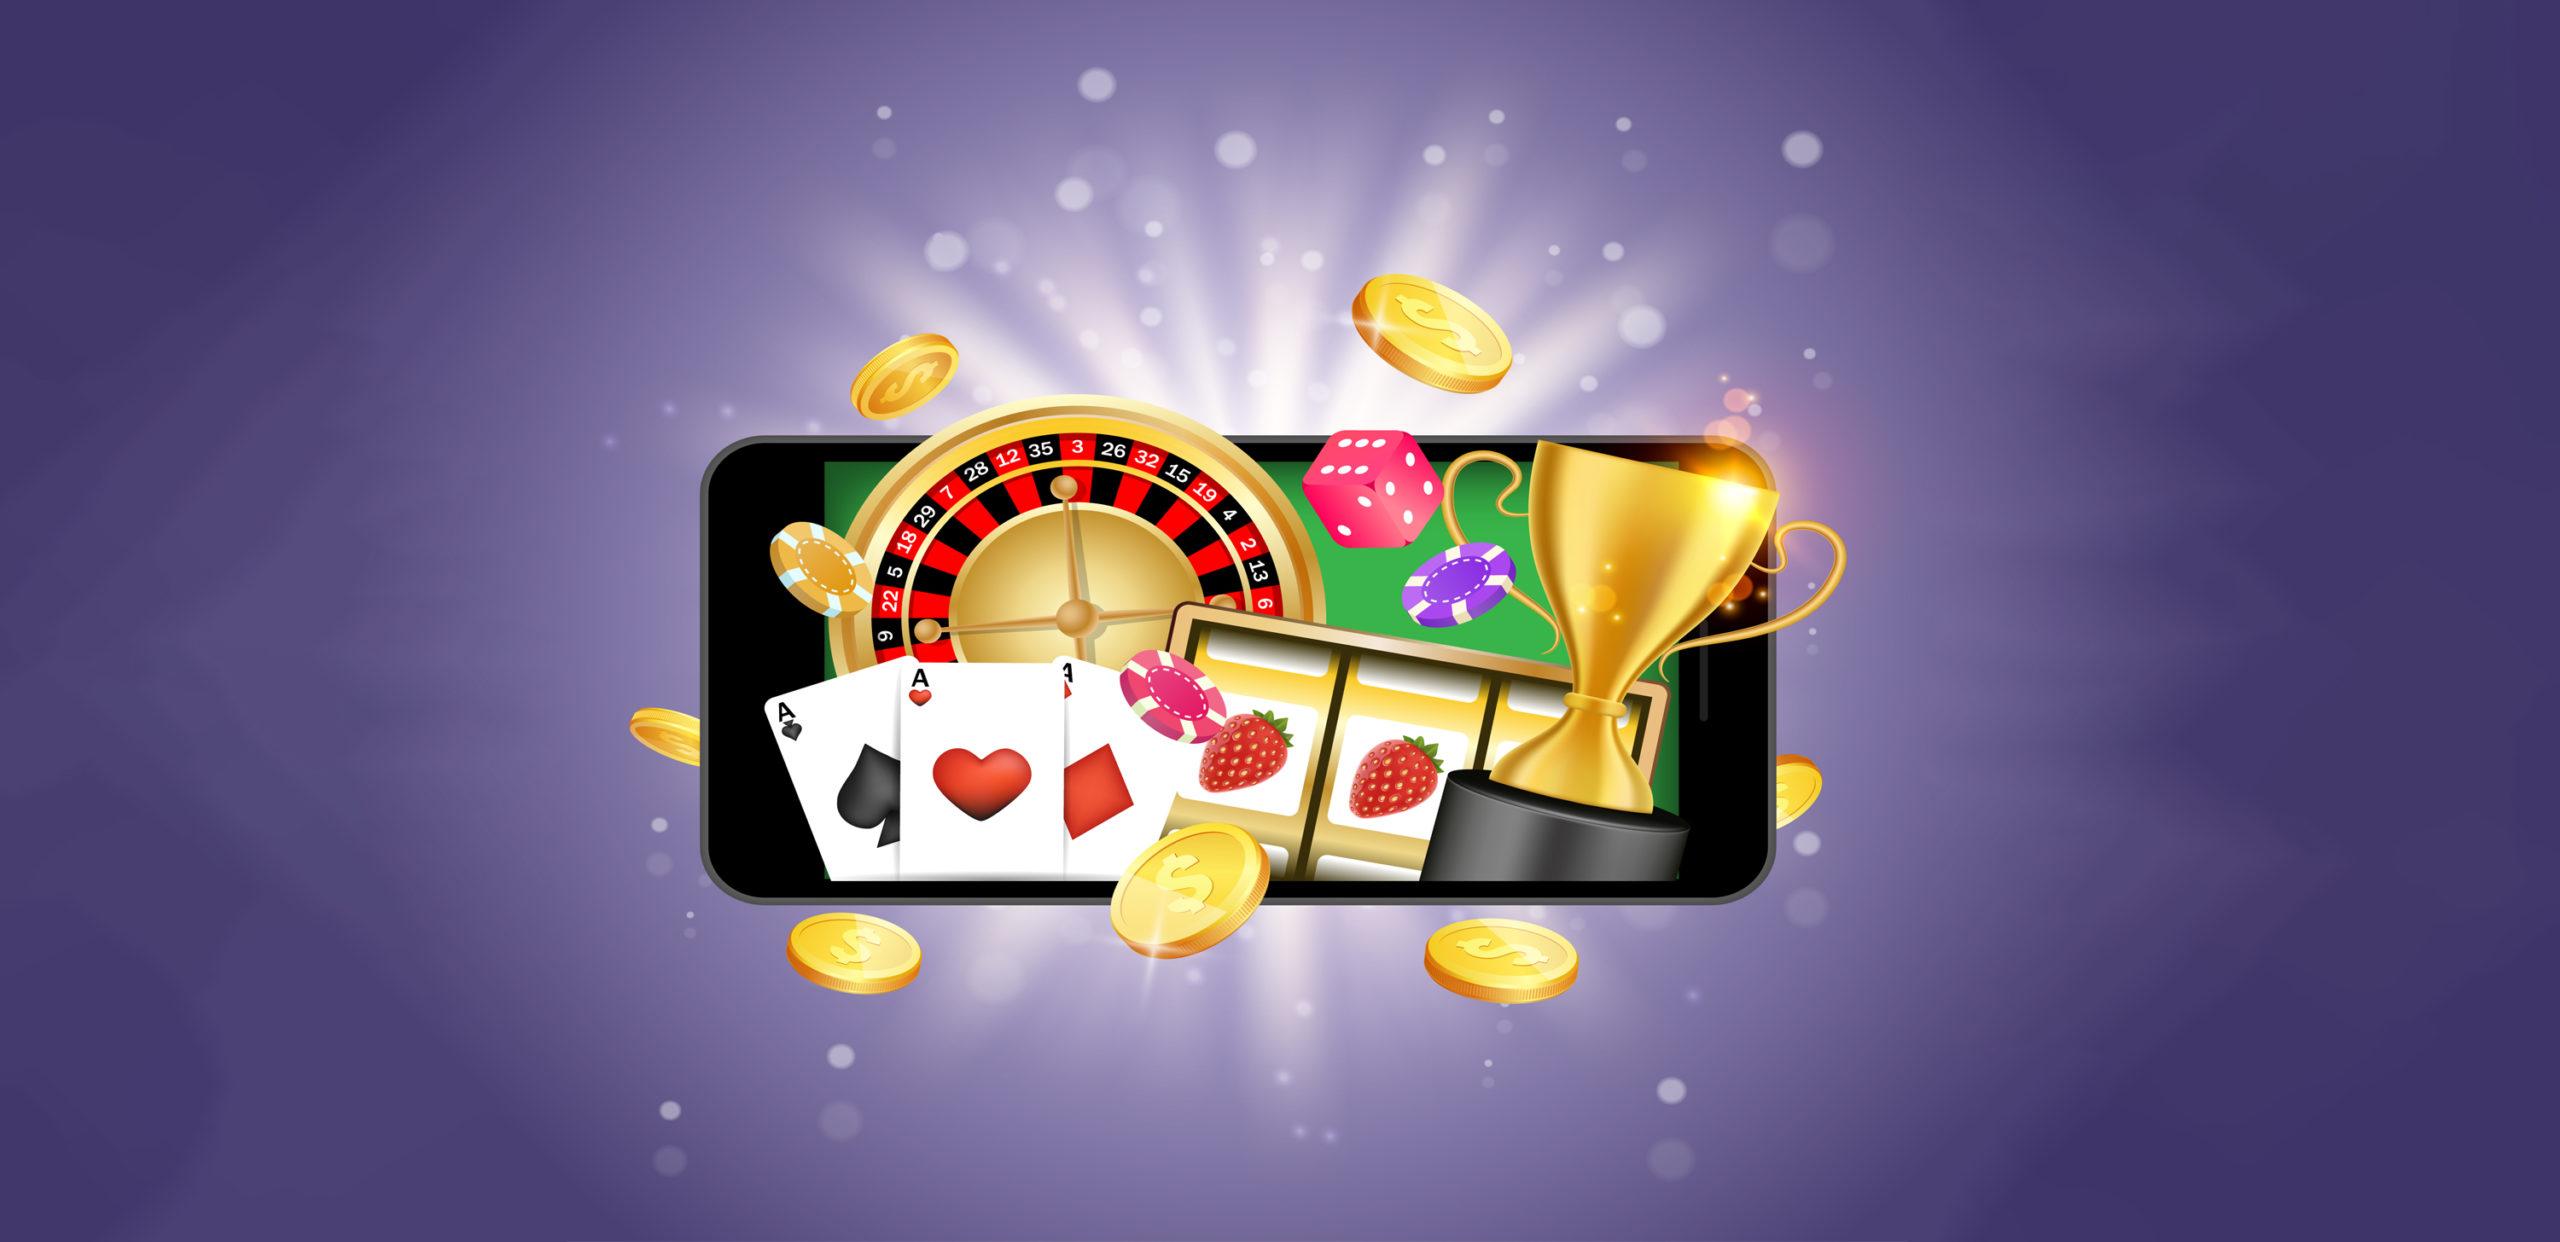 Google regulates Unauthorized Gambling Apps